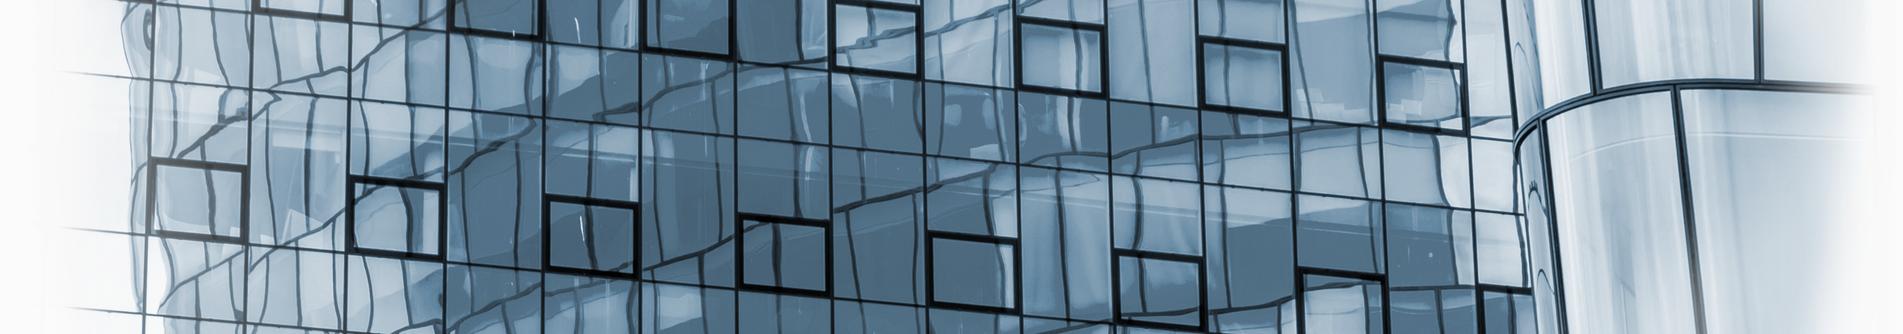 Provaria Standorte Softwarelösungen MS Dynamics SharePoint Azure Office 365